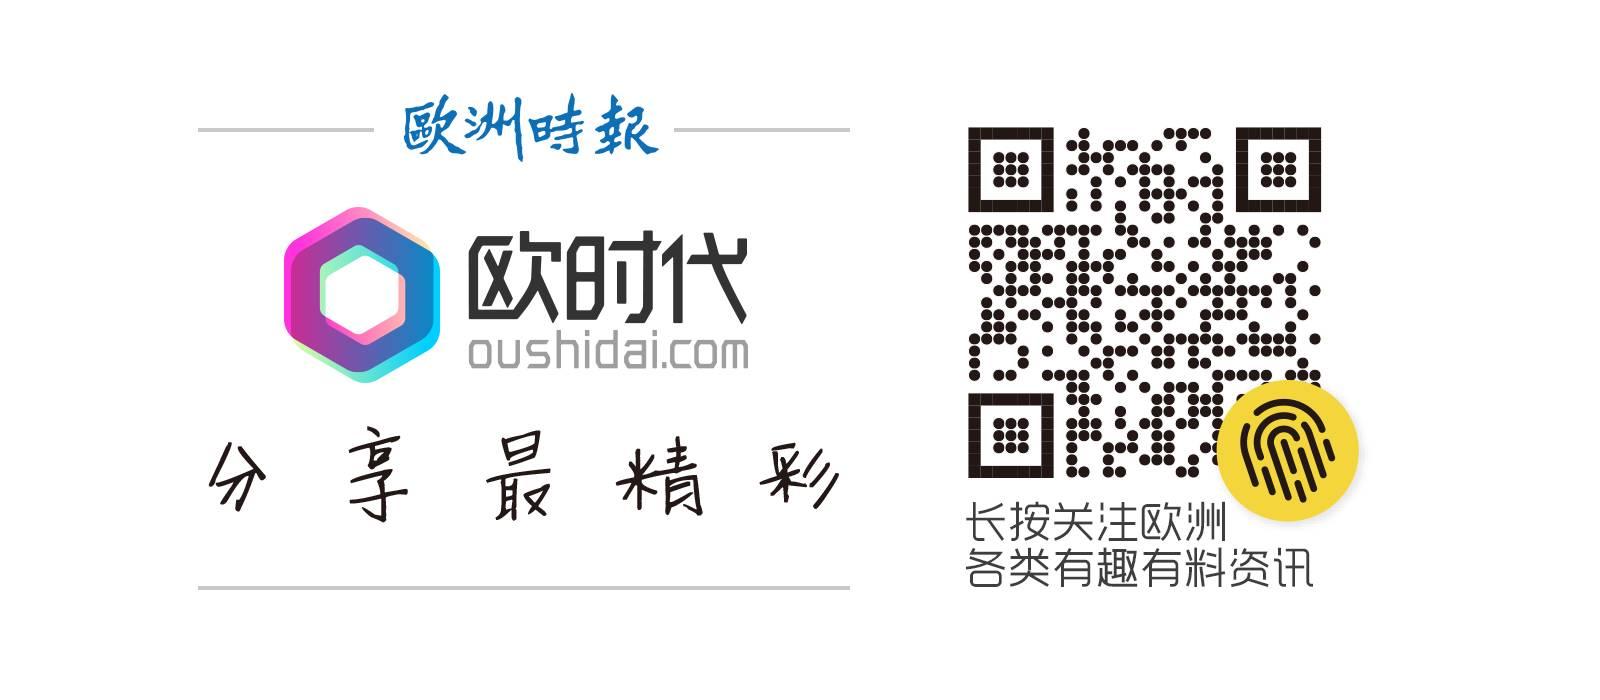 http://www.oushidai.com/static/upload/2017/03/14/20170314003457000000_1_80931_77.jpg